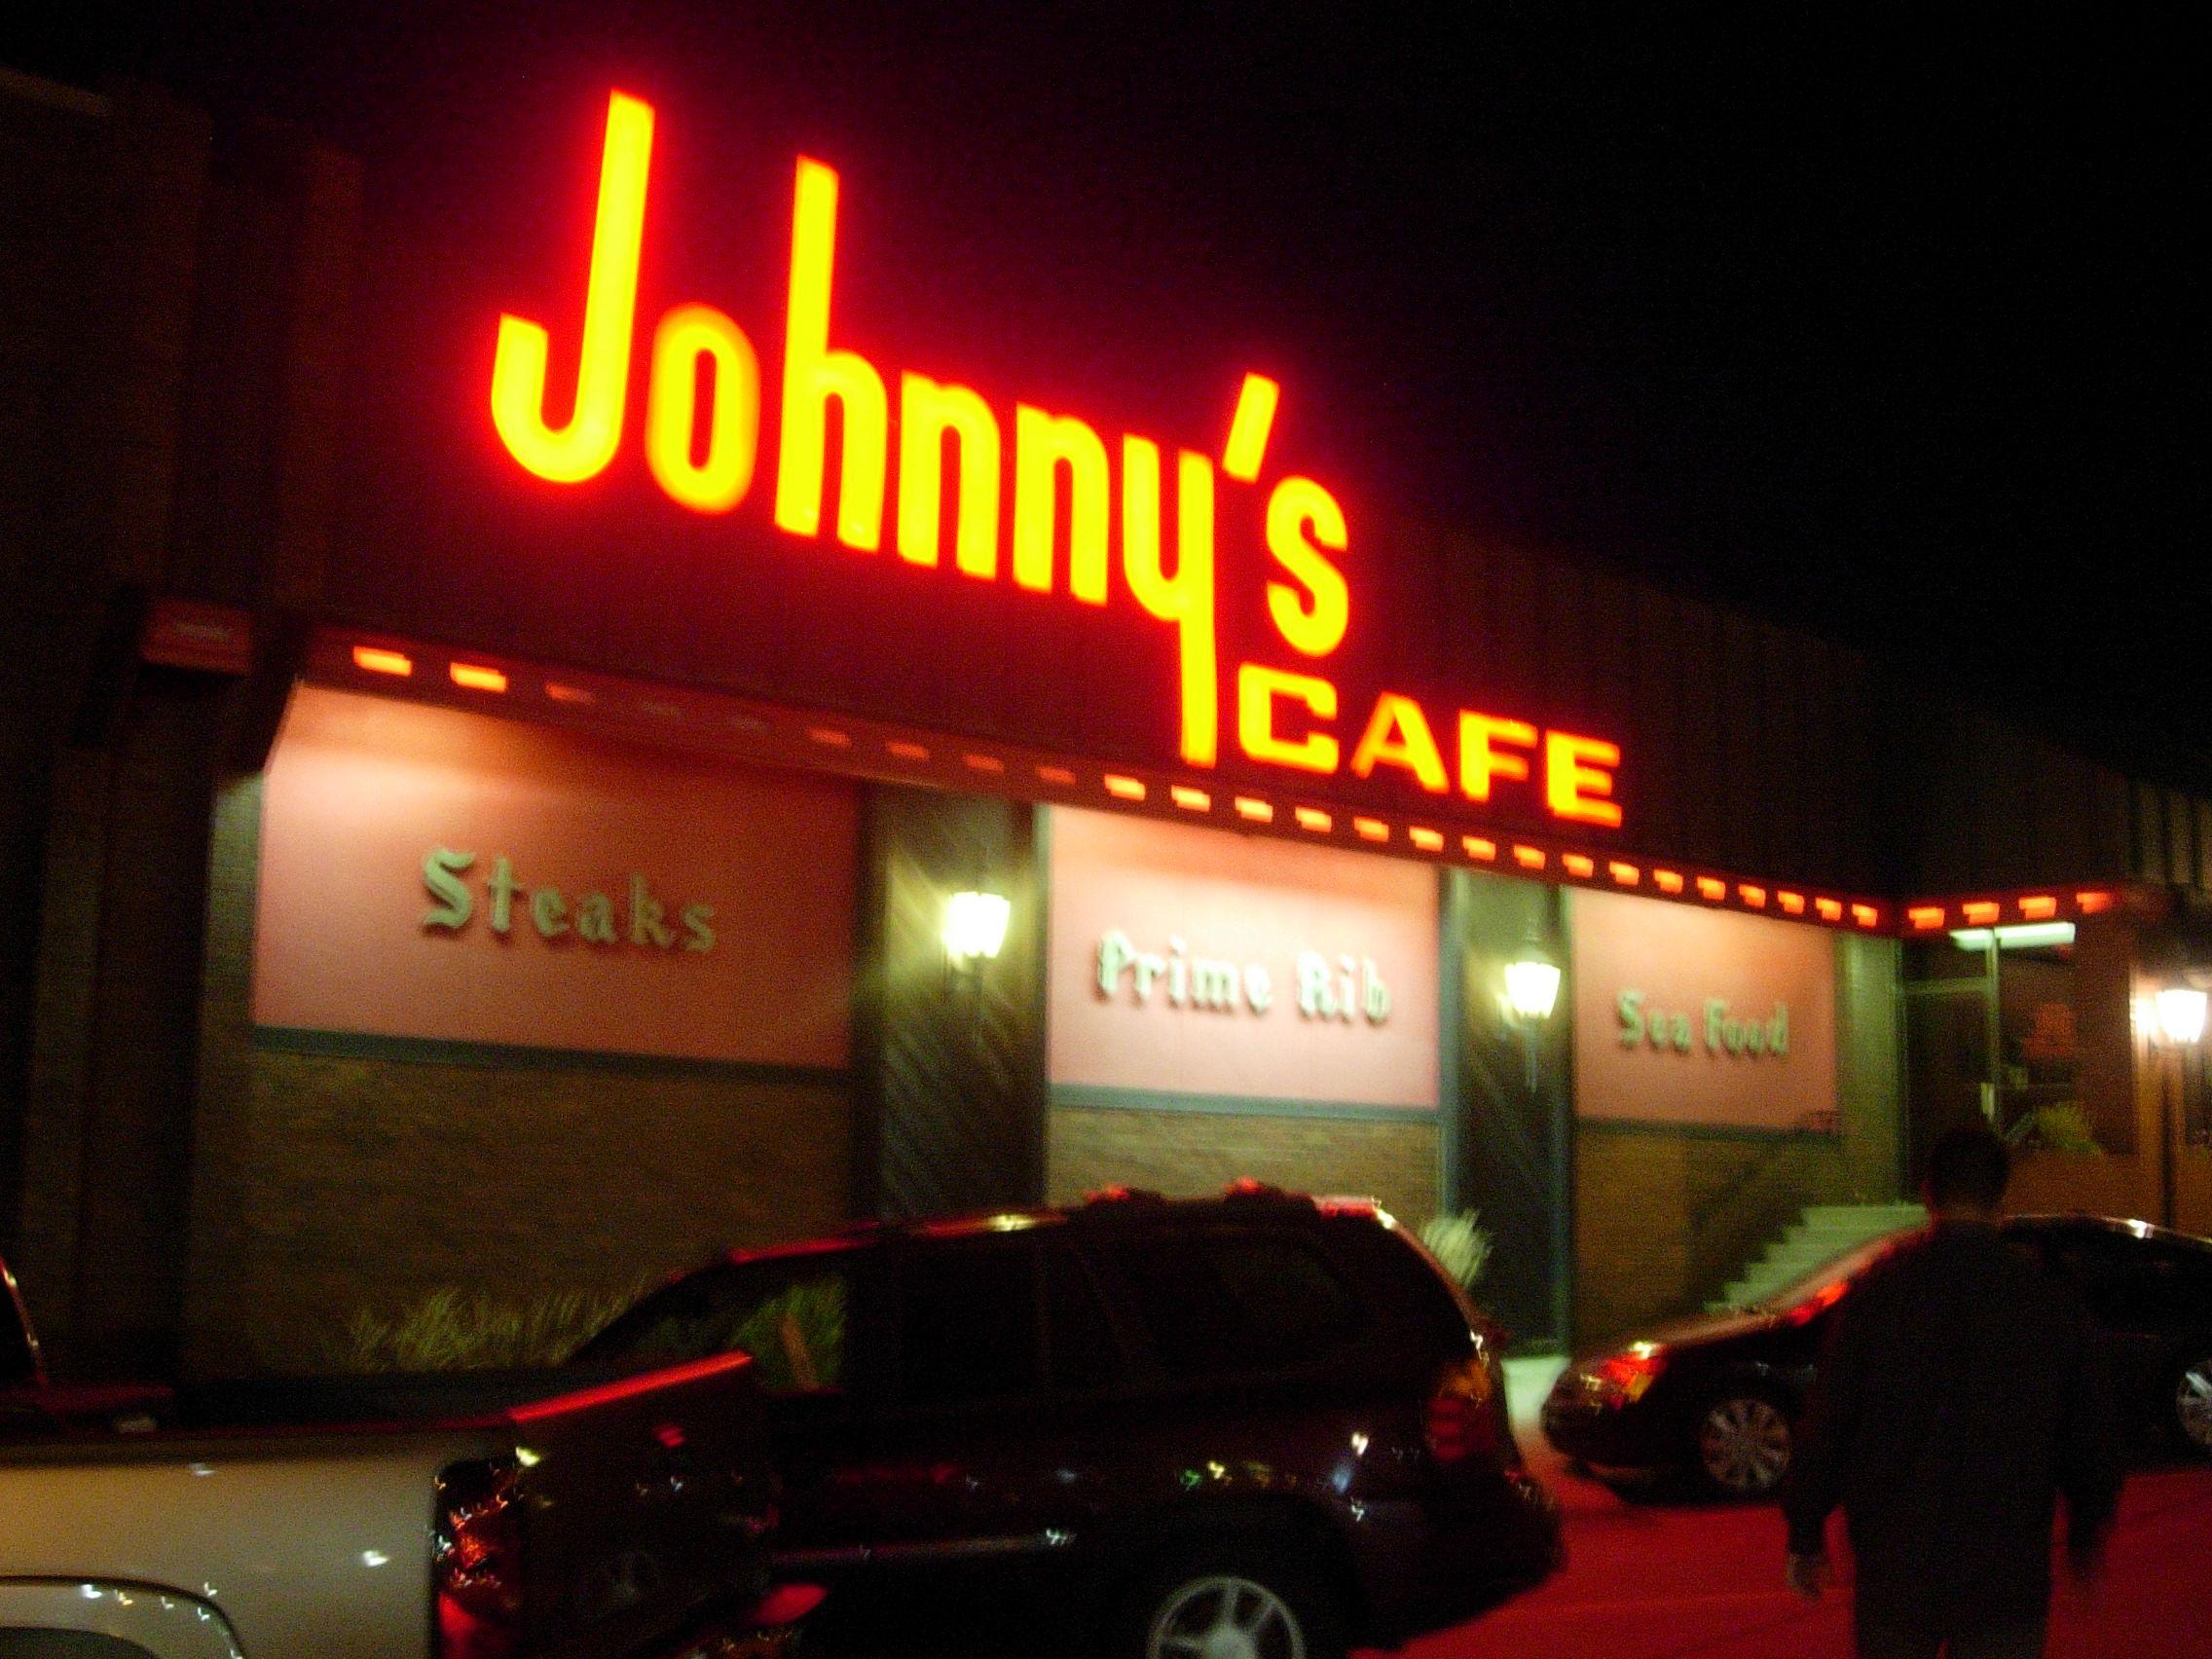 Johnny S Cafe 4702 South 27th Street Stockyards Omaha Nebraska Original Omaha Steakhouse Established 1922 Travel Nebraska Omaha Nebraska Nebraska